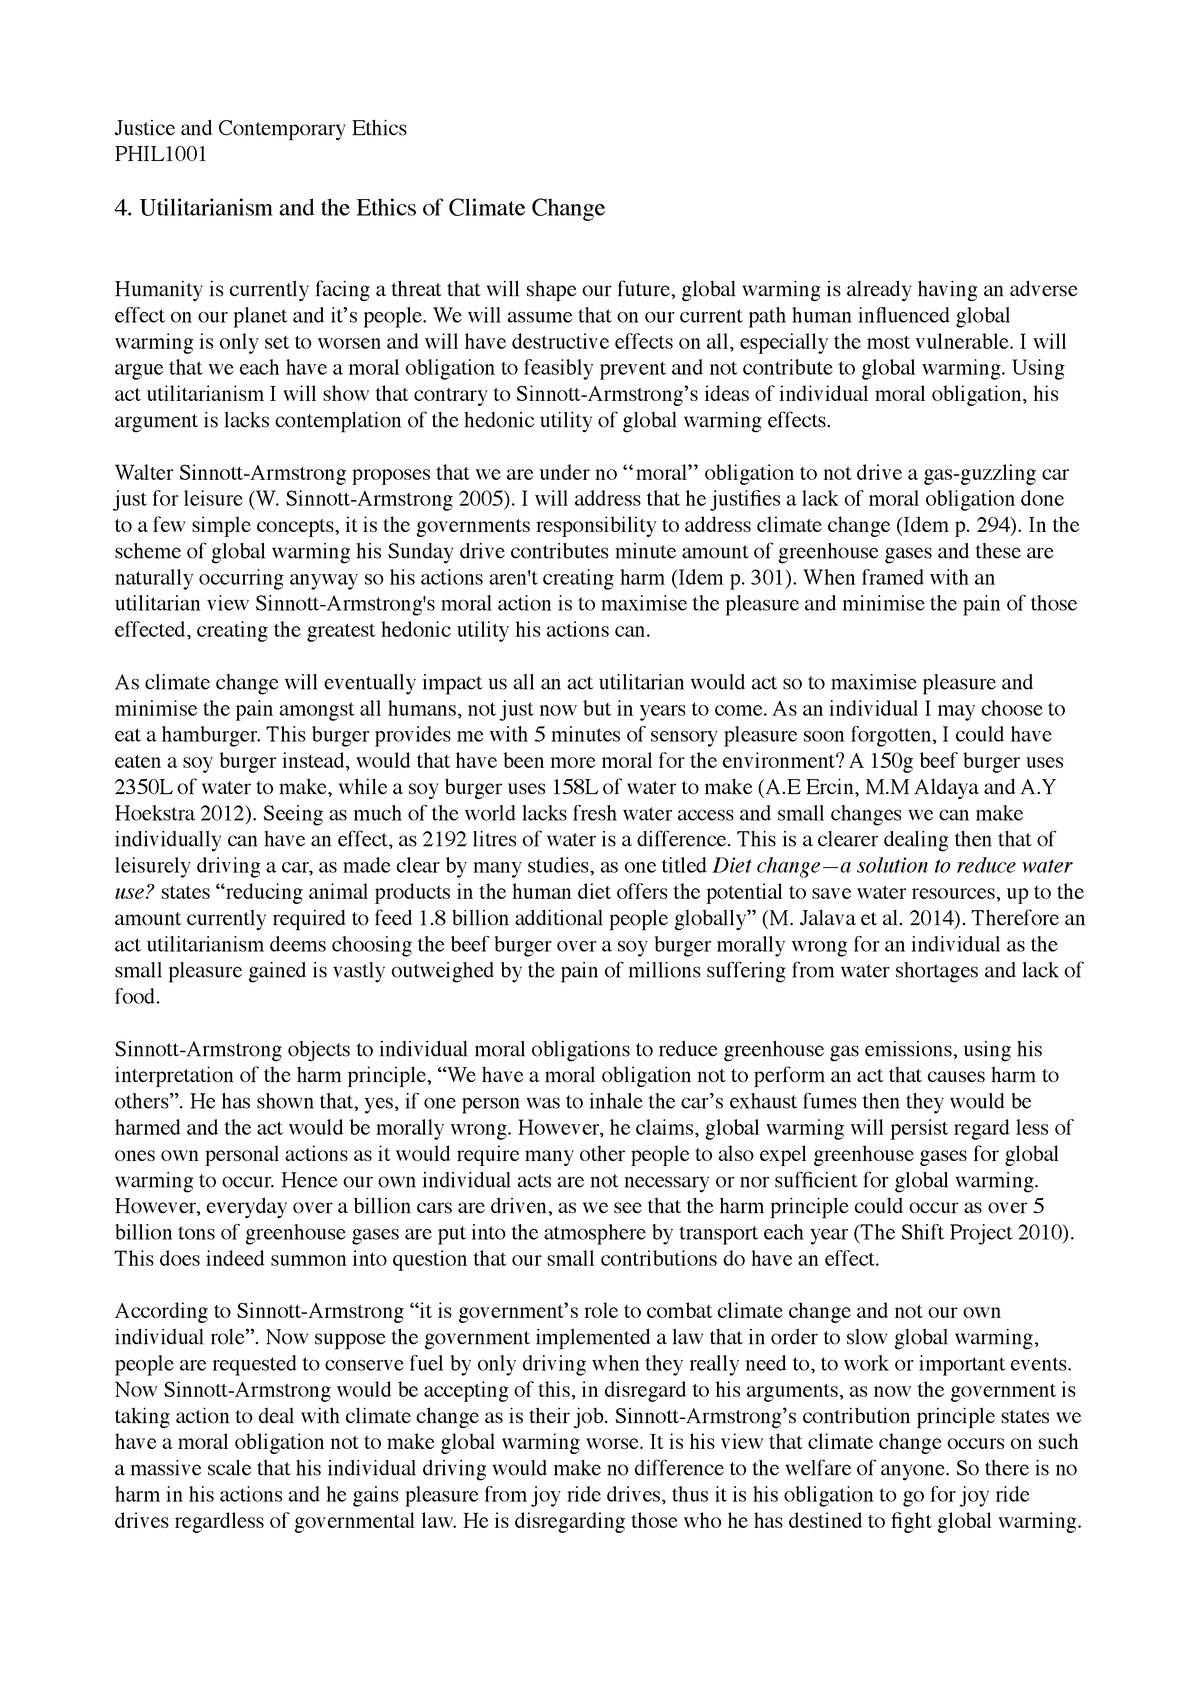 Business report format sample pdf